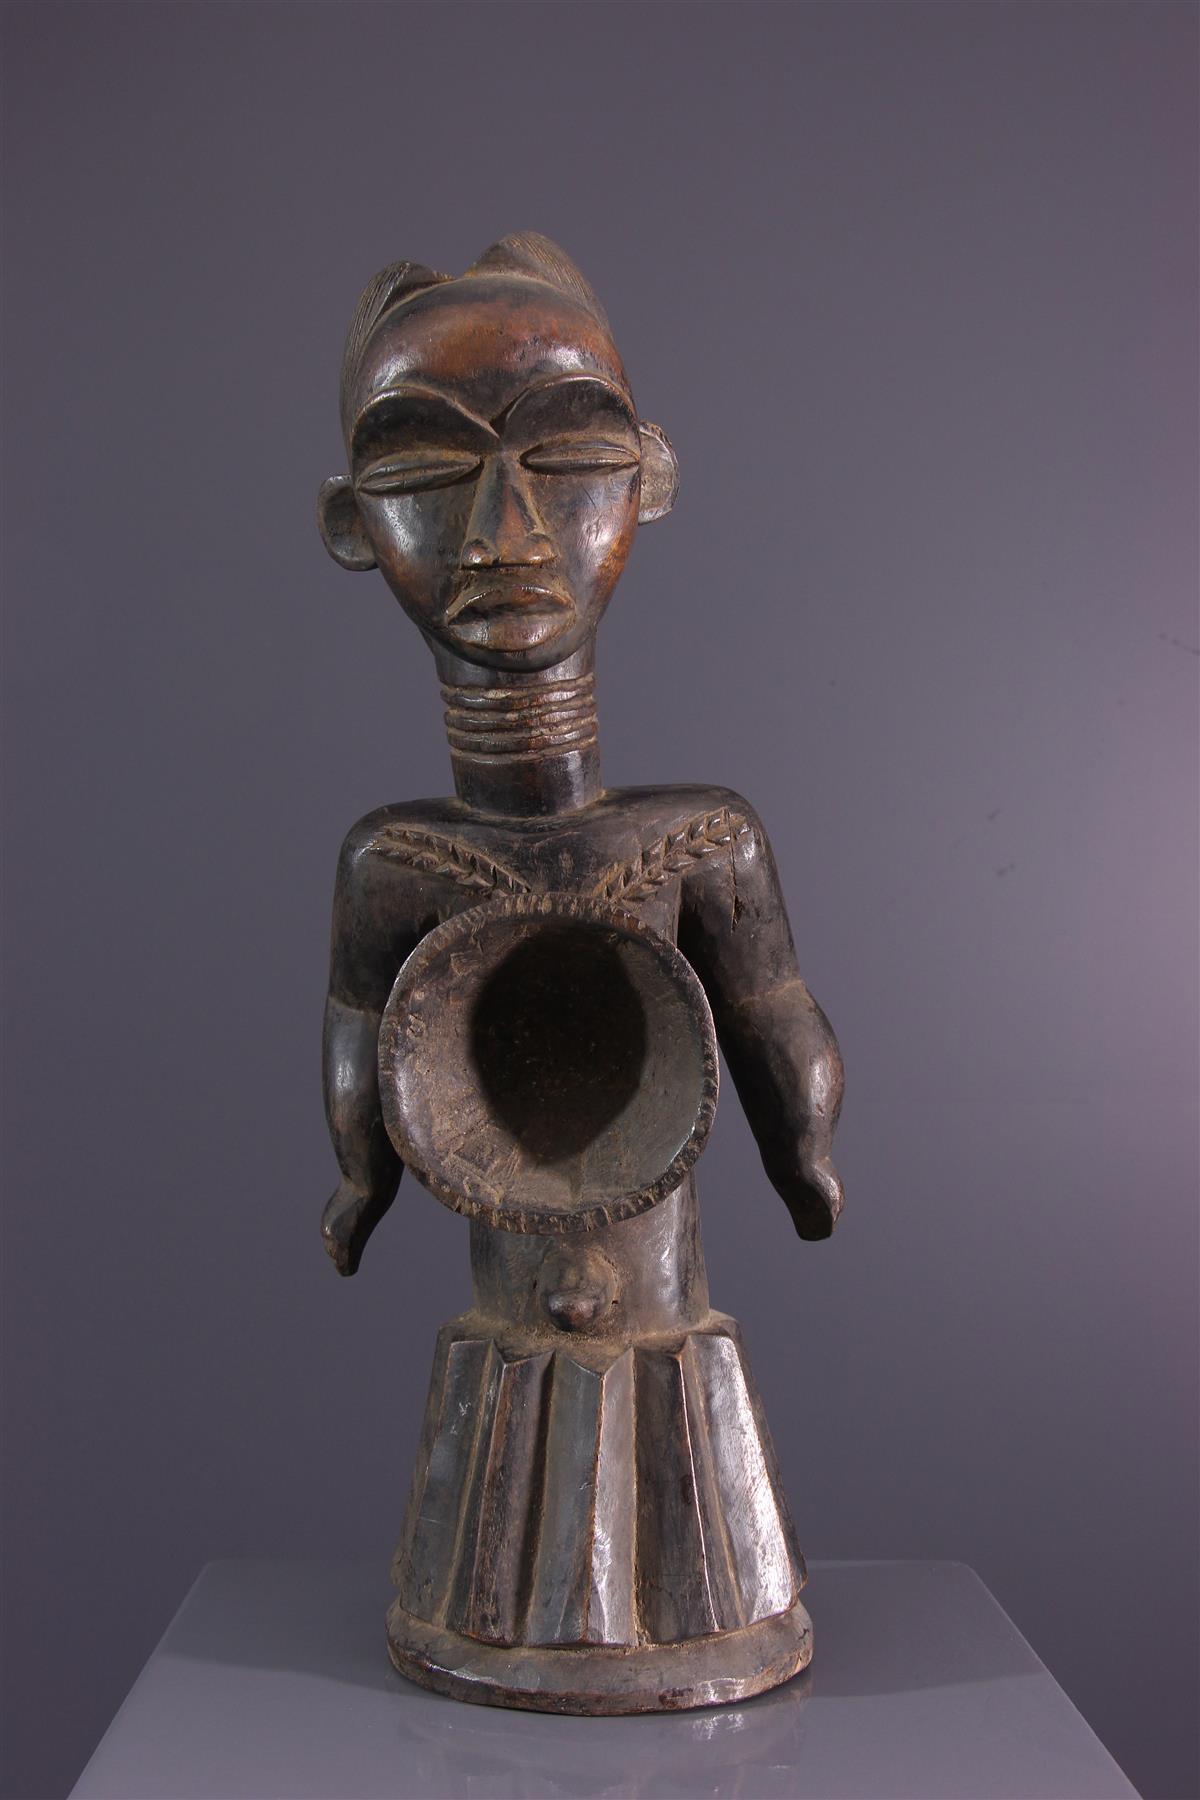 Dan, Lümè, Liberia - African art